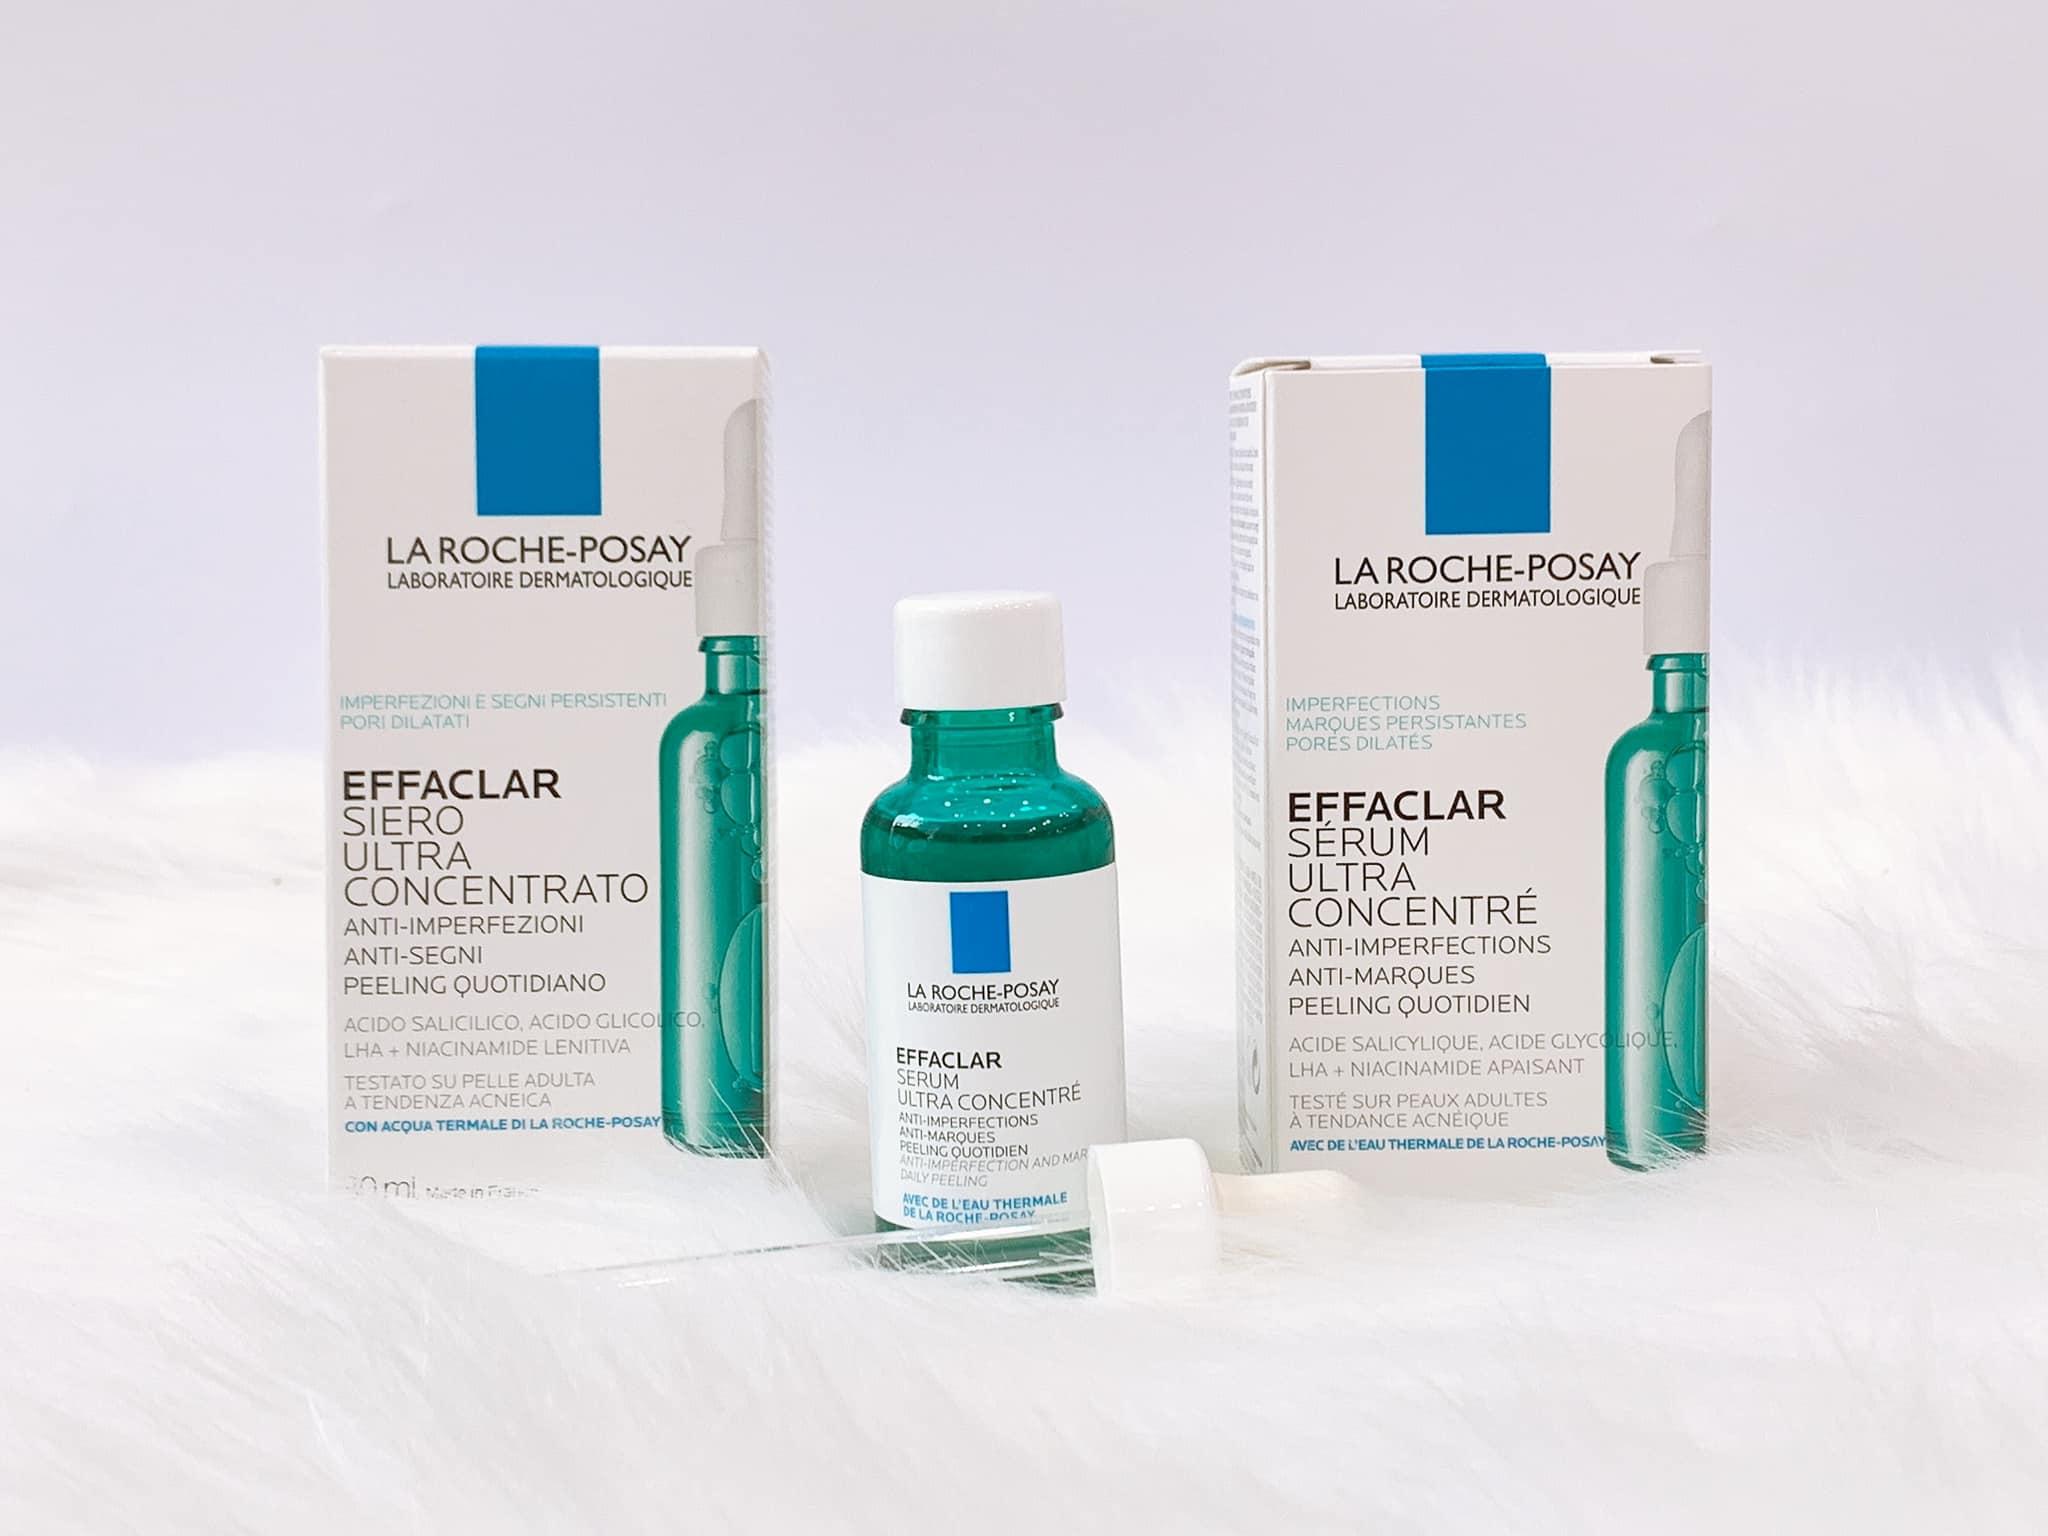 Tinh Chất Giảm Mụn Effaclar Ultra Concentrated Serum La RochePosay 30ml